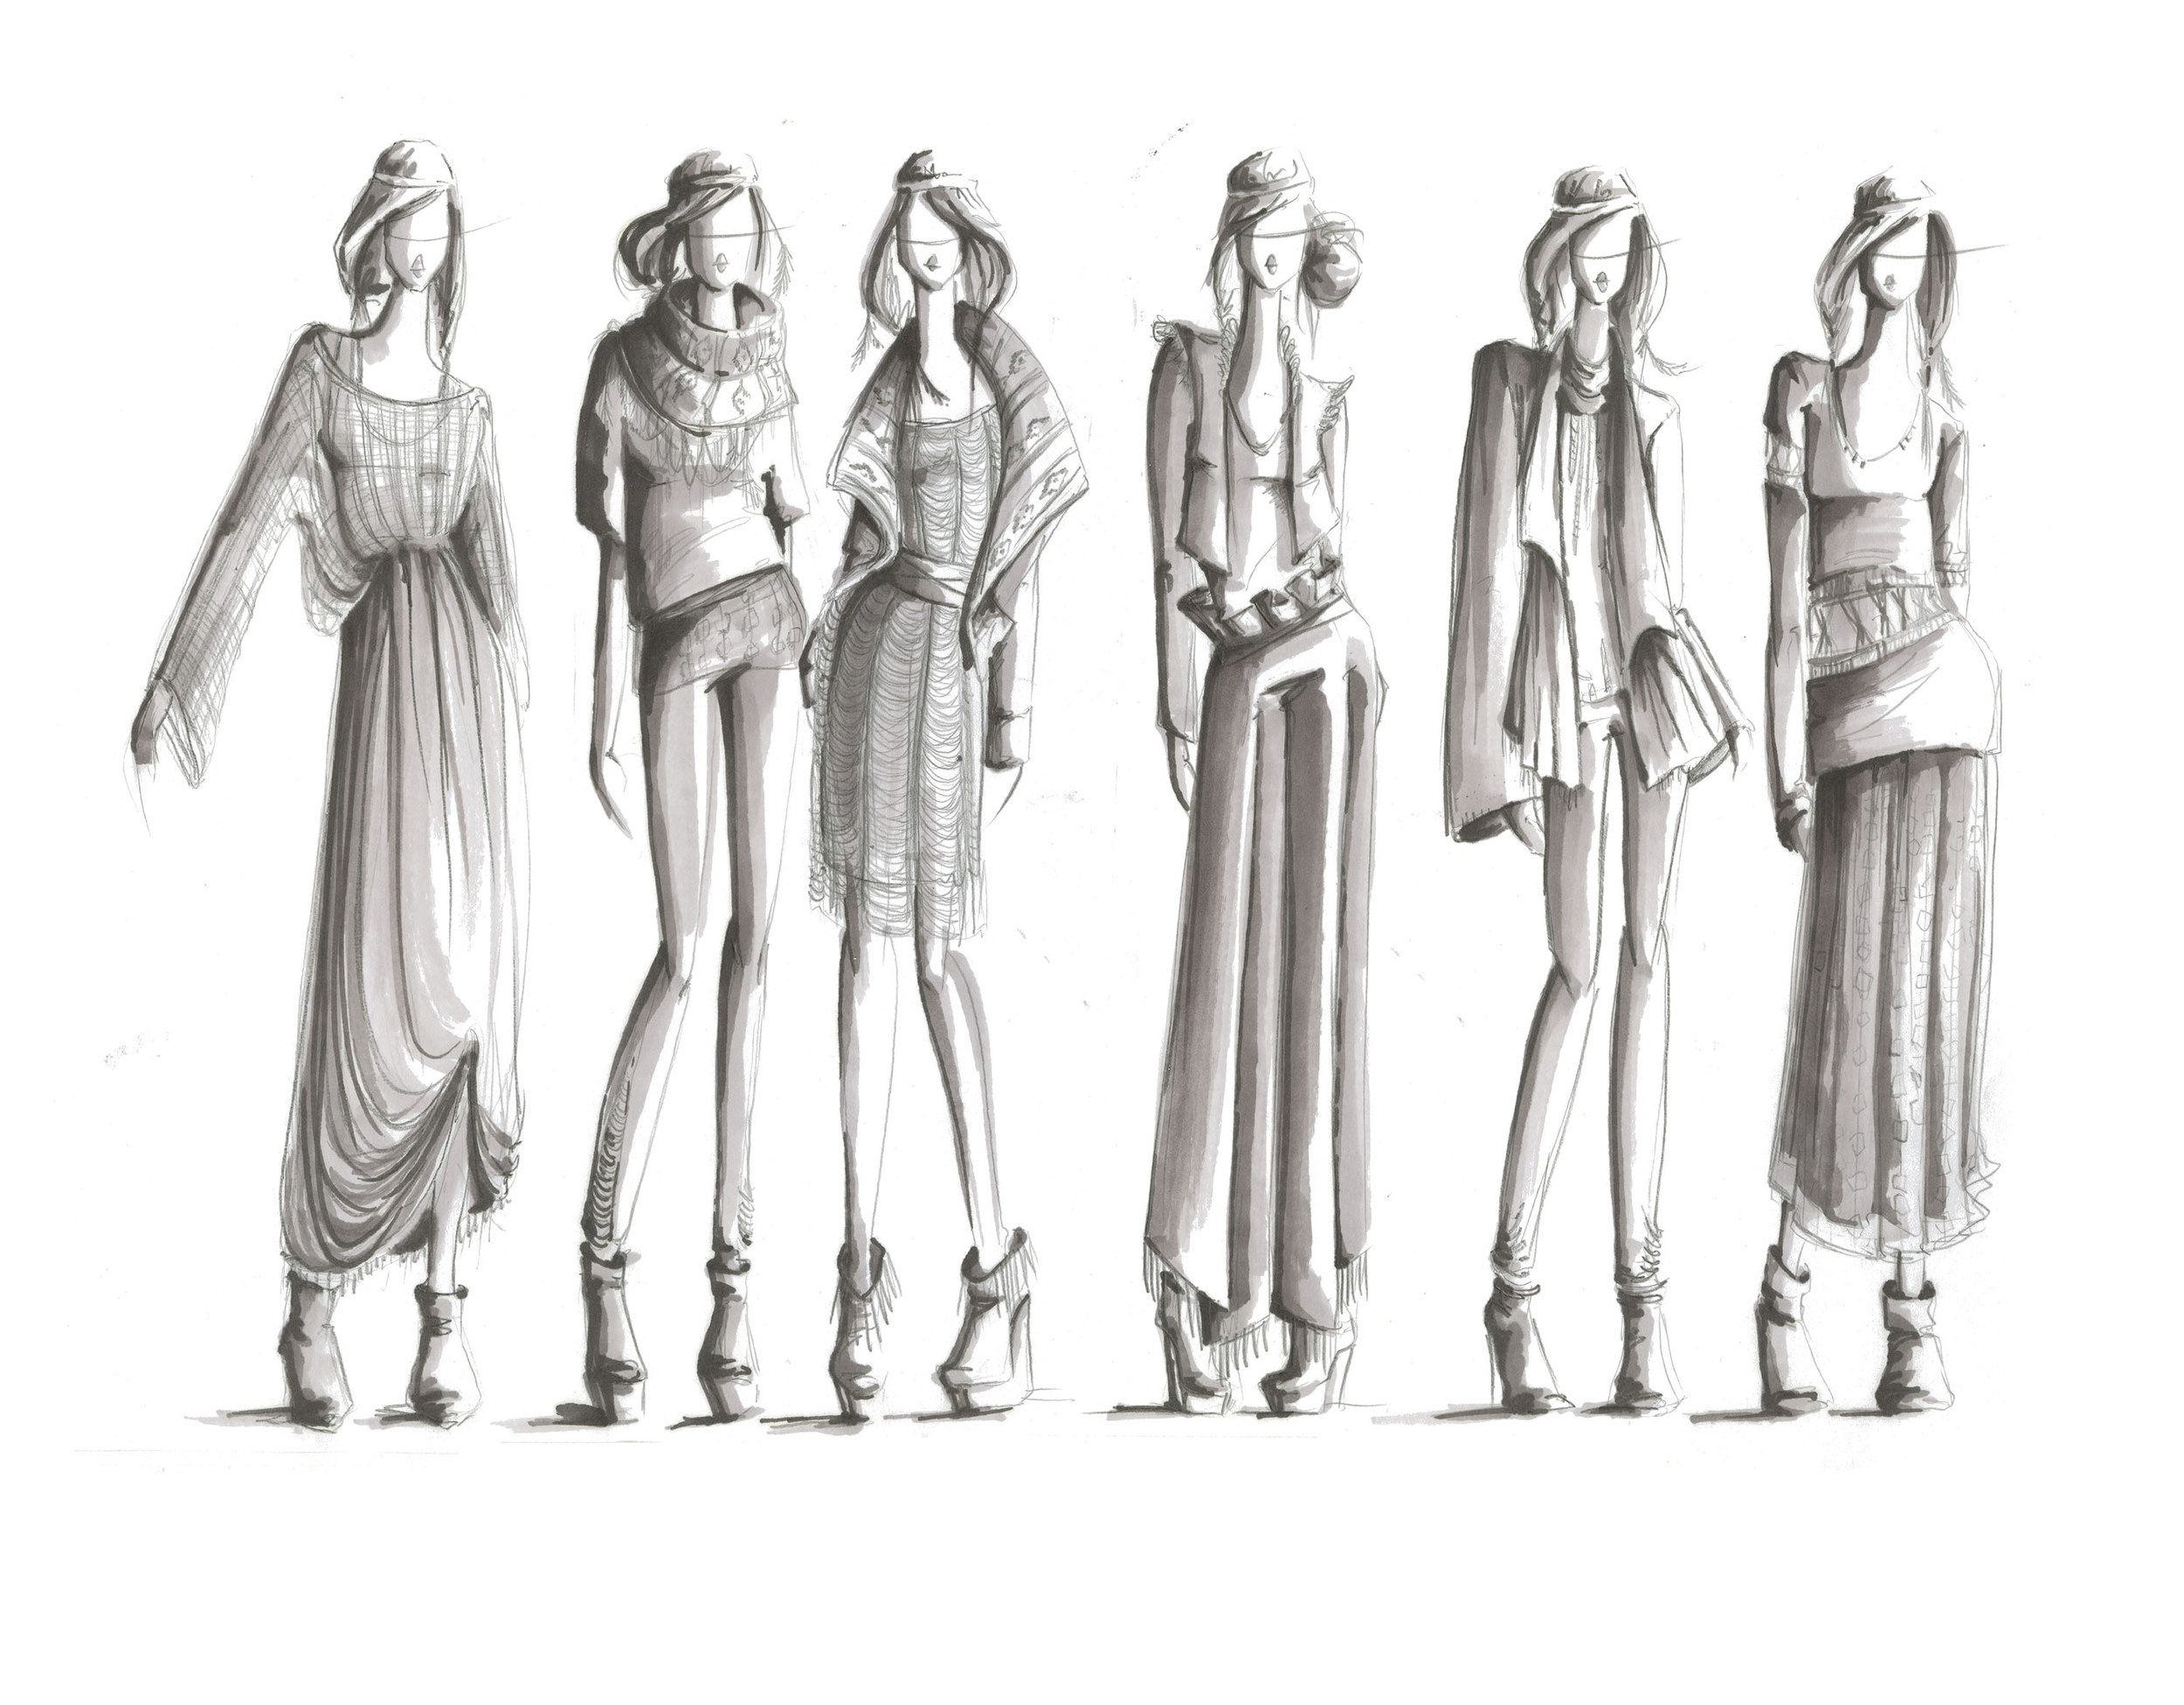 Winter Fashion Drawings